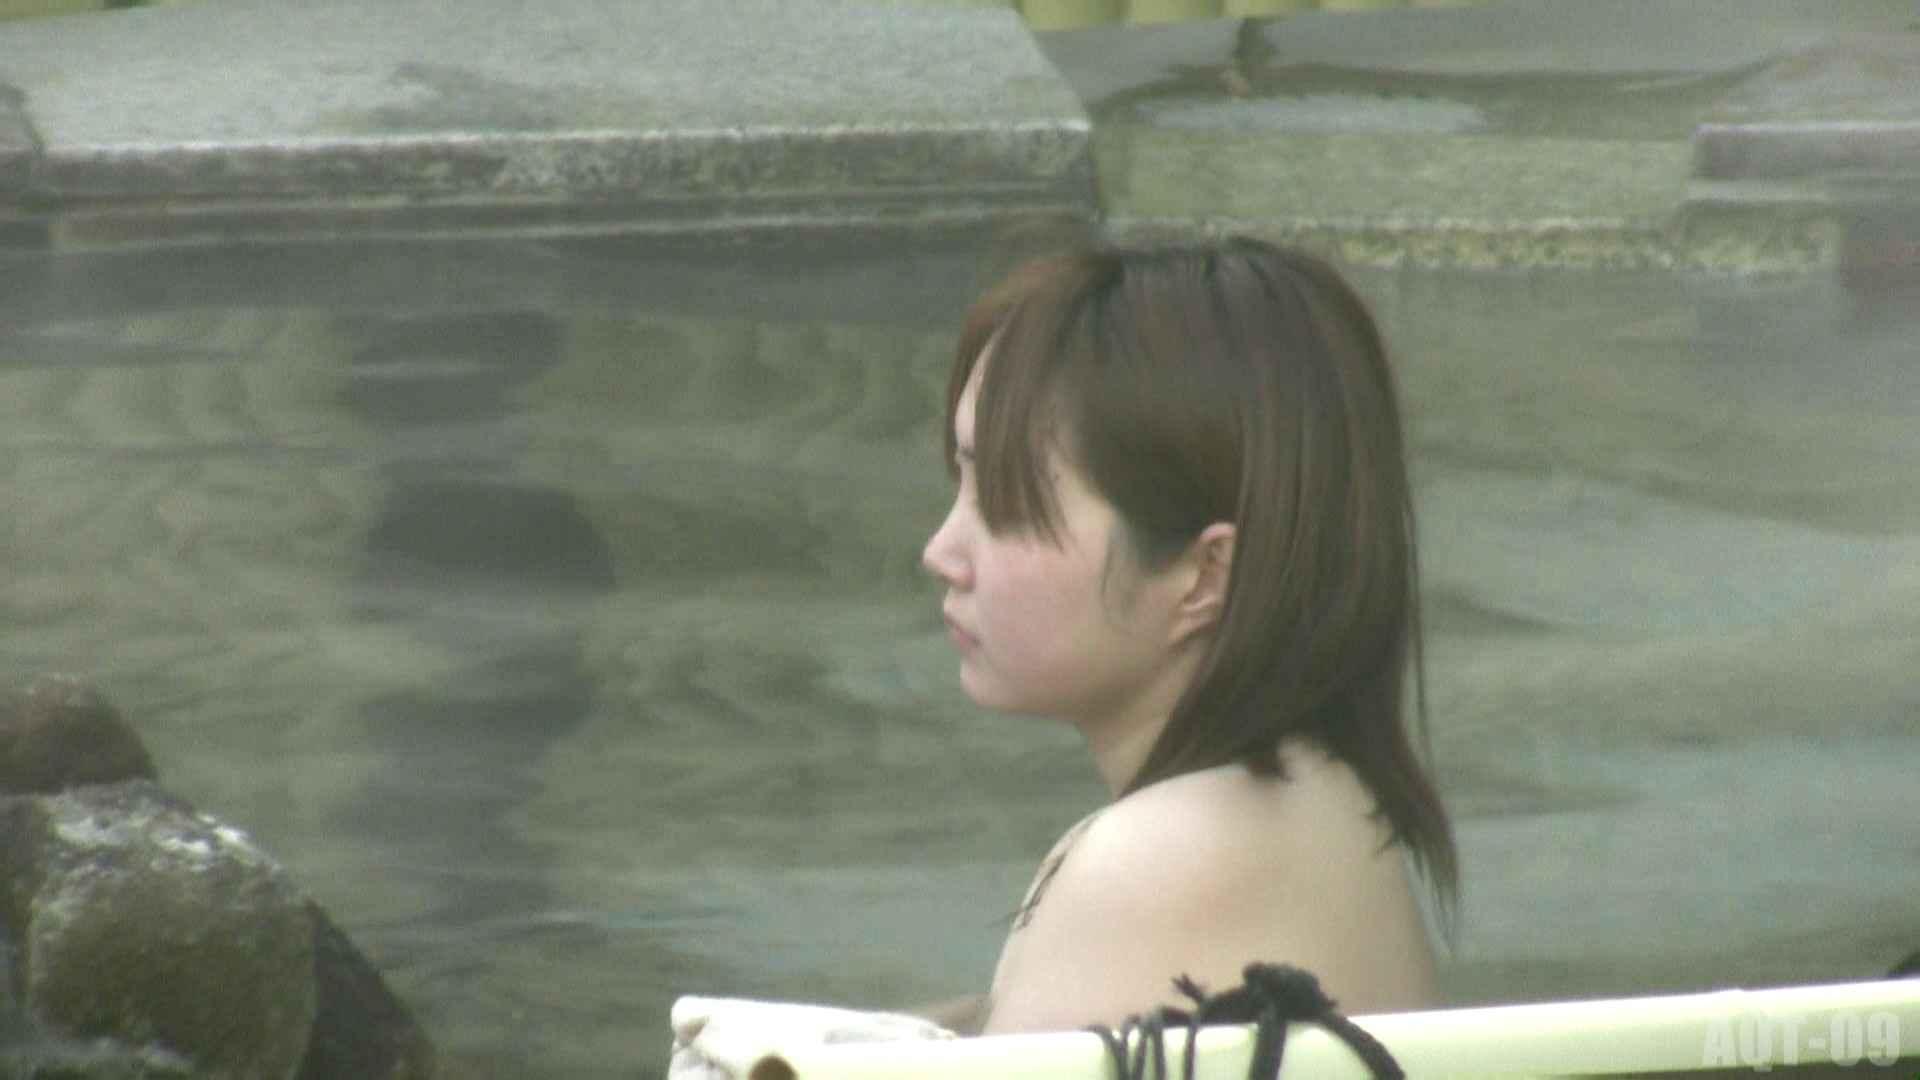 Aquaな露天風呂Vol.781 OLセックス 盗撮動画紹介 110画像 35